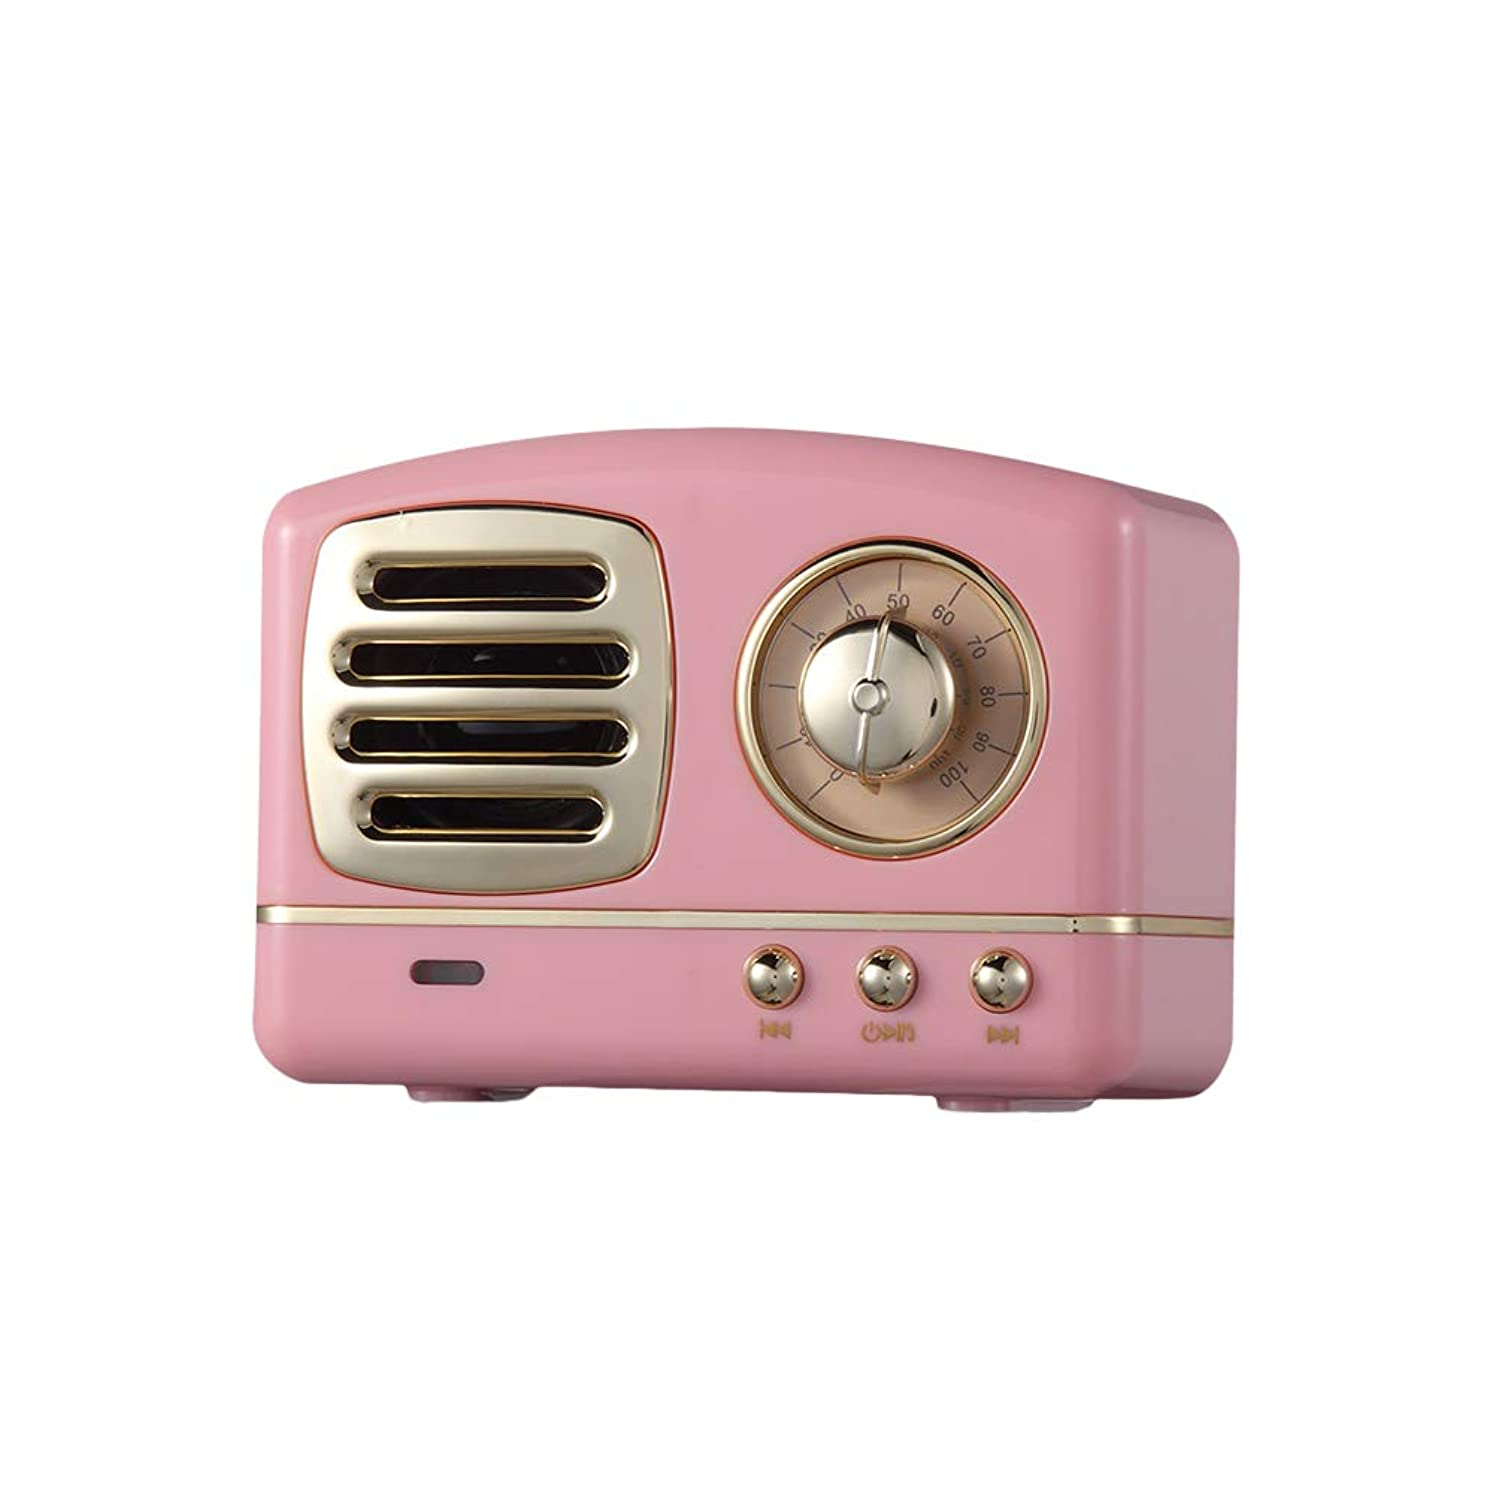 UKCOCO Retro HiFi Stereo Bluetooth V4.1 Speaker Portable Wireless Speaker with FM Radio (Pink)